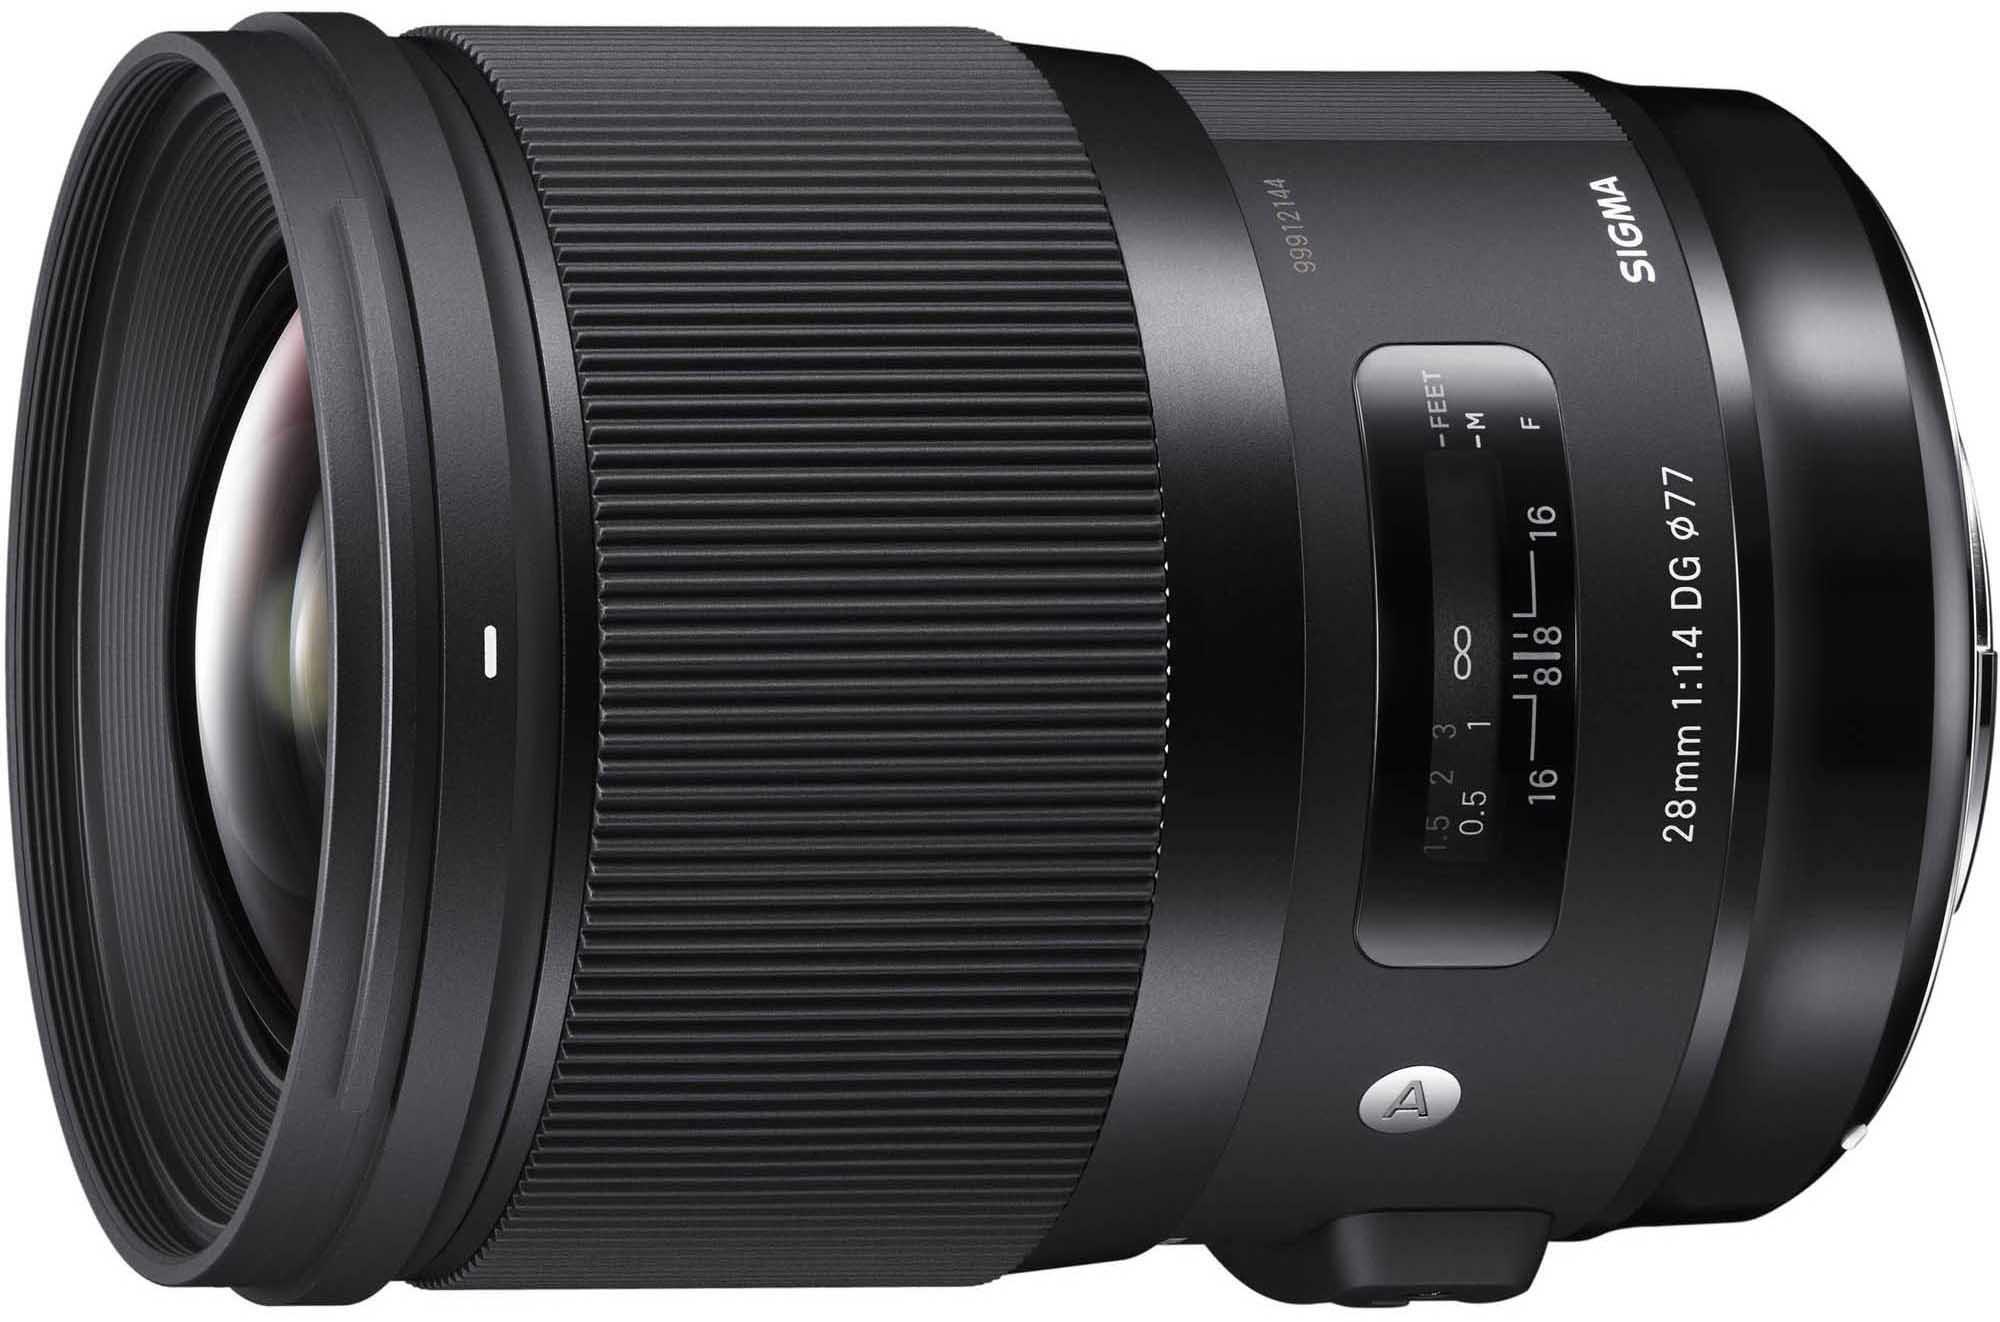 Sigma 28mm f/1.4 DG HSM Art objektiiv Sonyle